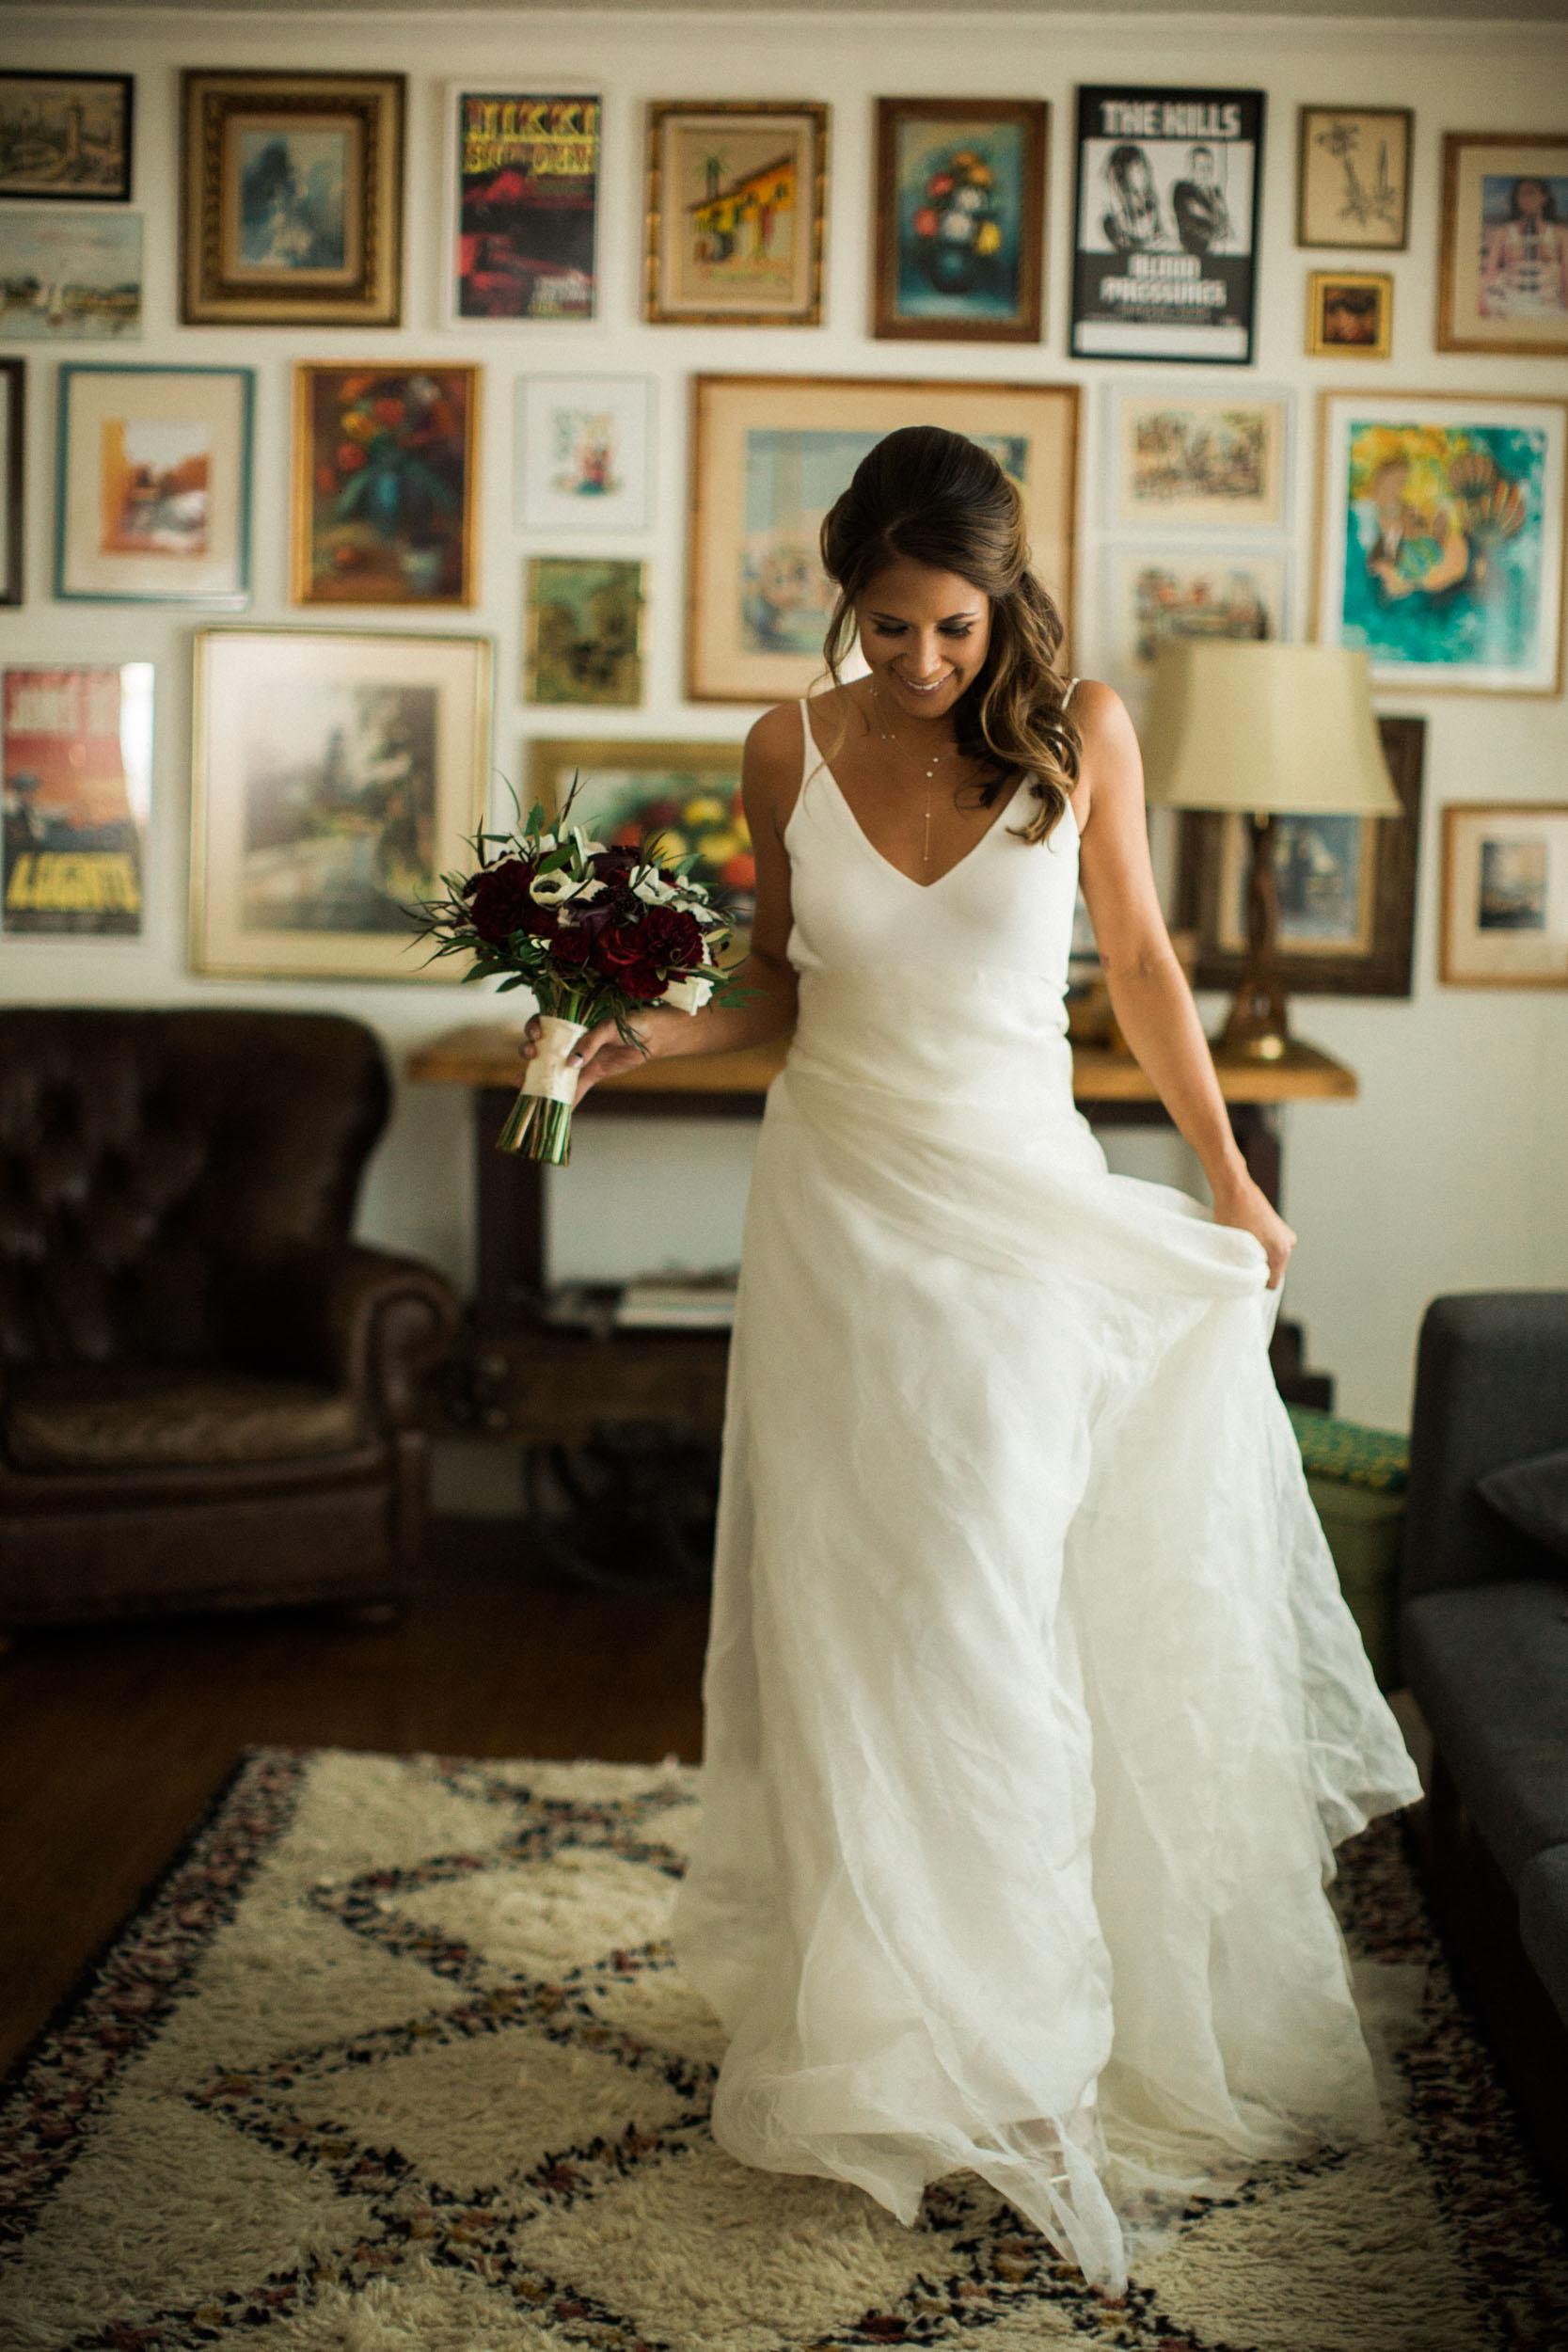 BKM-Photography-Highland-Park-Los-Angeles-Backyard-Wedding-0015.jpg